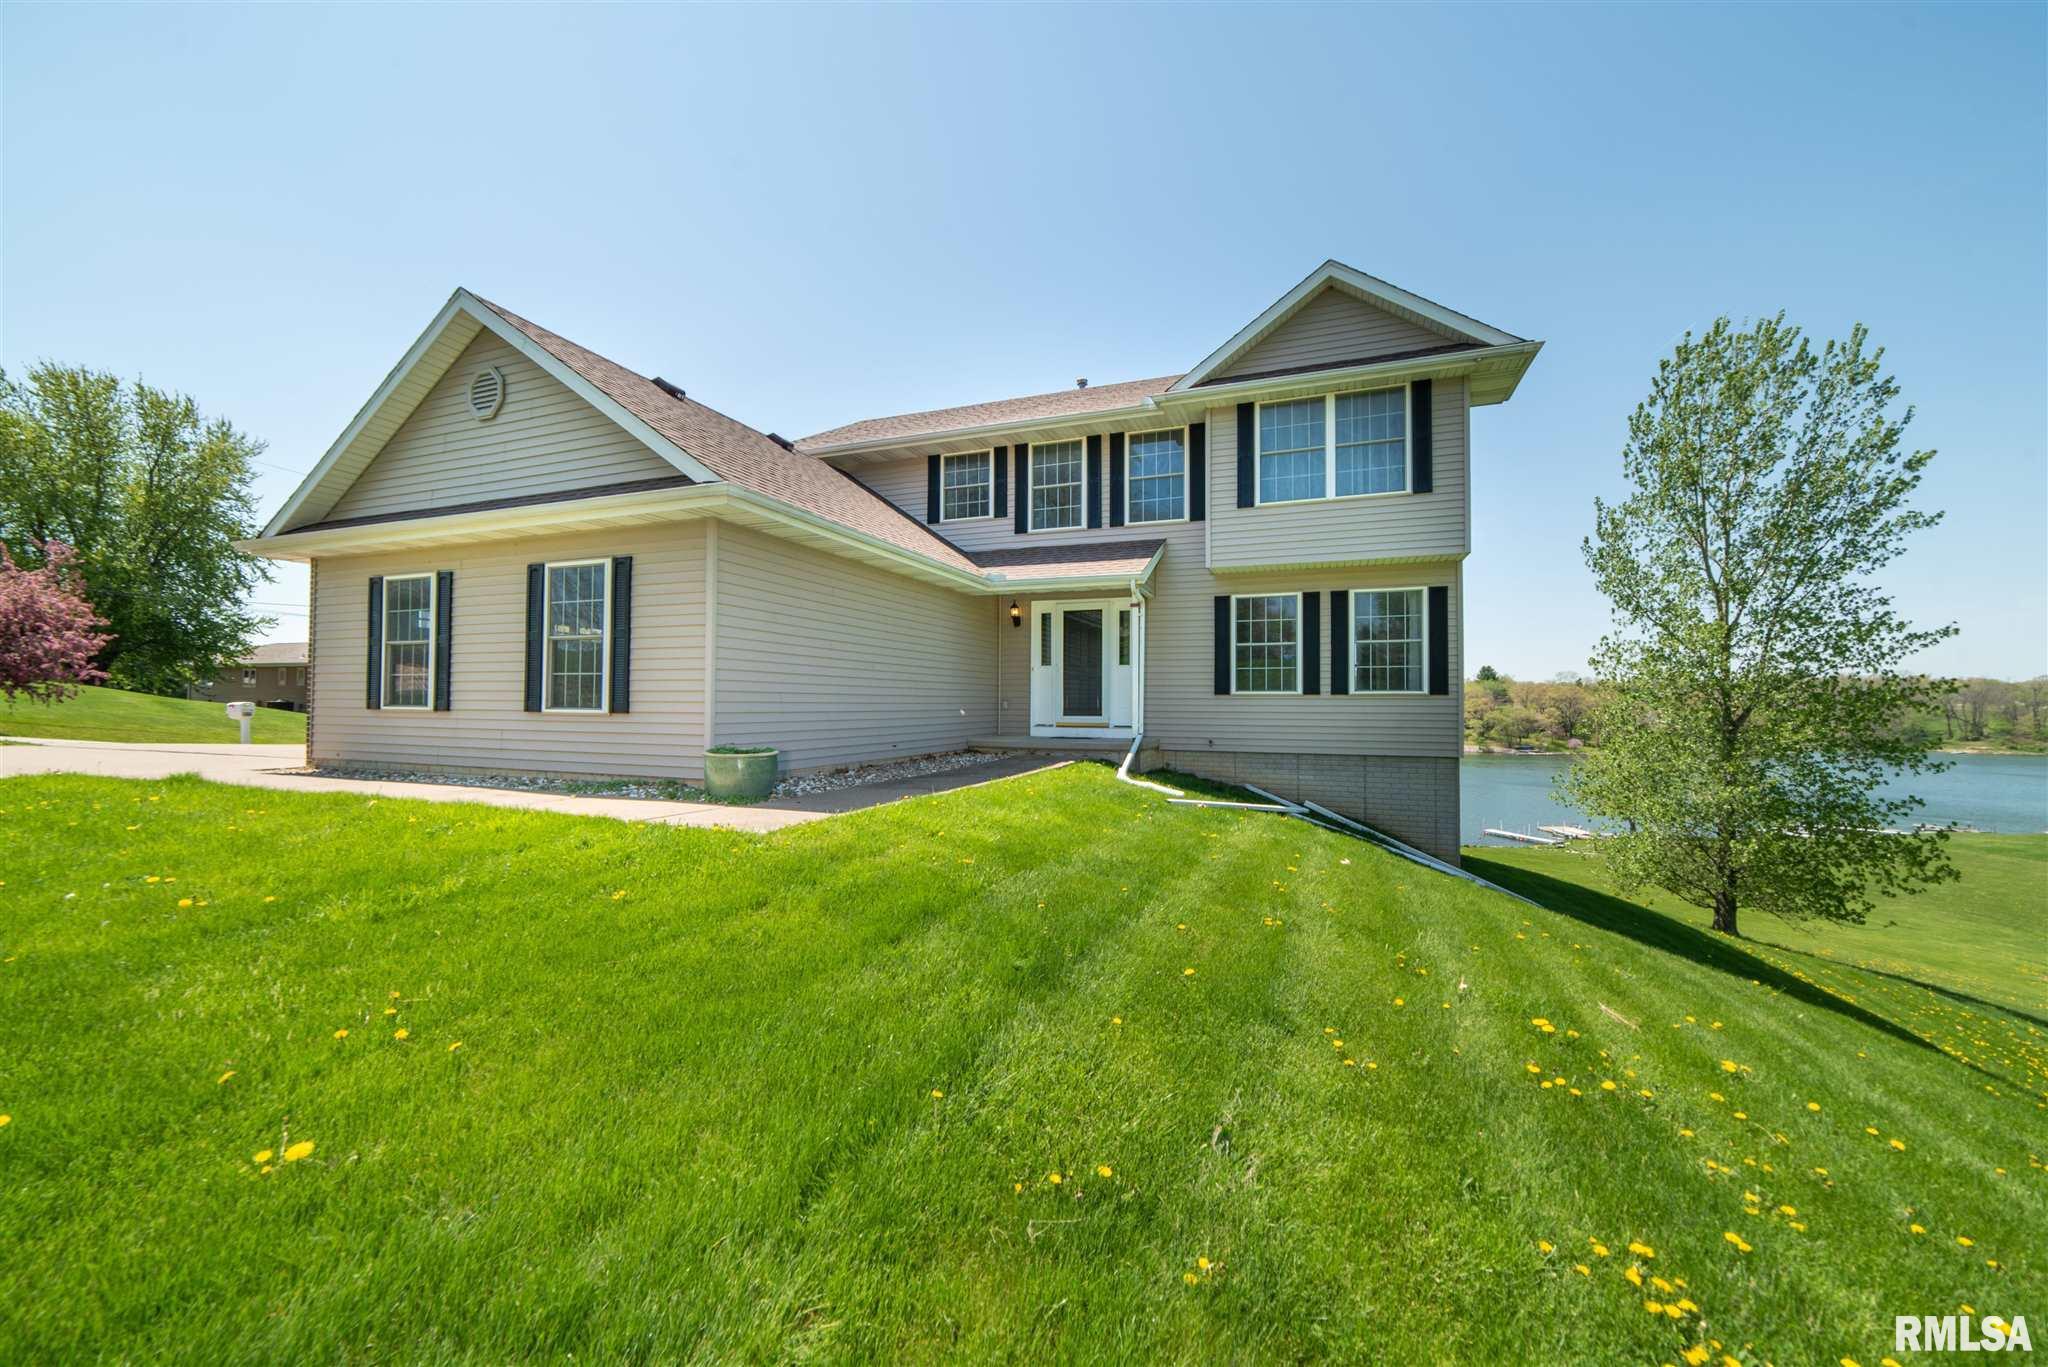 915 CRESTVIEW Property Photo - Sherrard, IL real estate listing